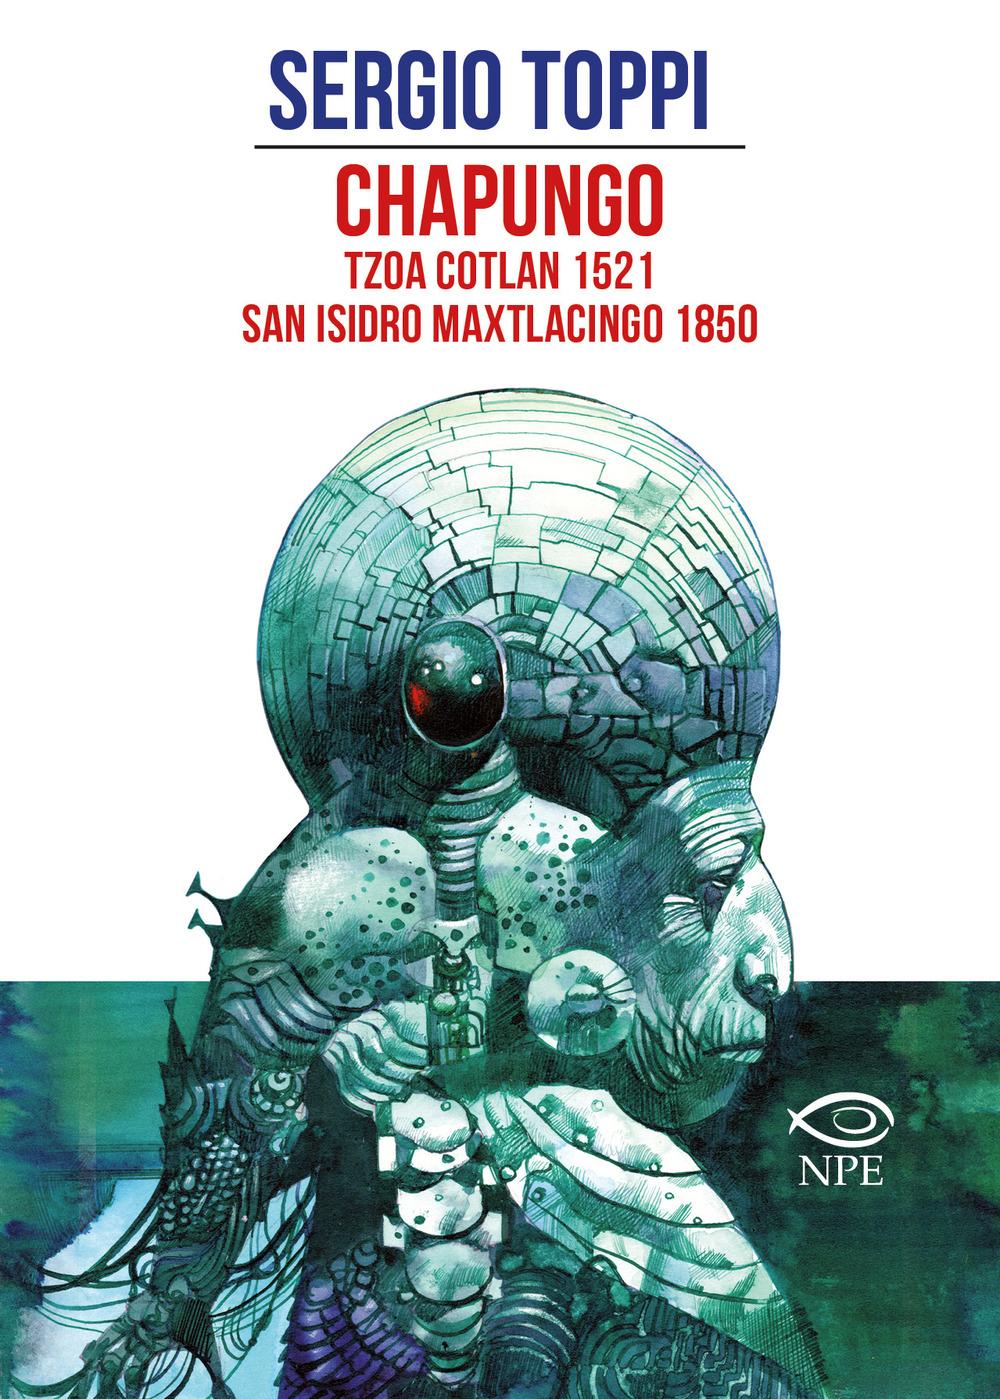 CHAPUNGO-TZOA COTLAN 1521-SAN ISIDRO MAXTLACINGO 1850 - 9788836270200